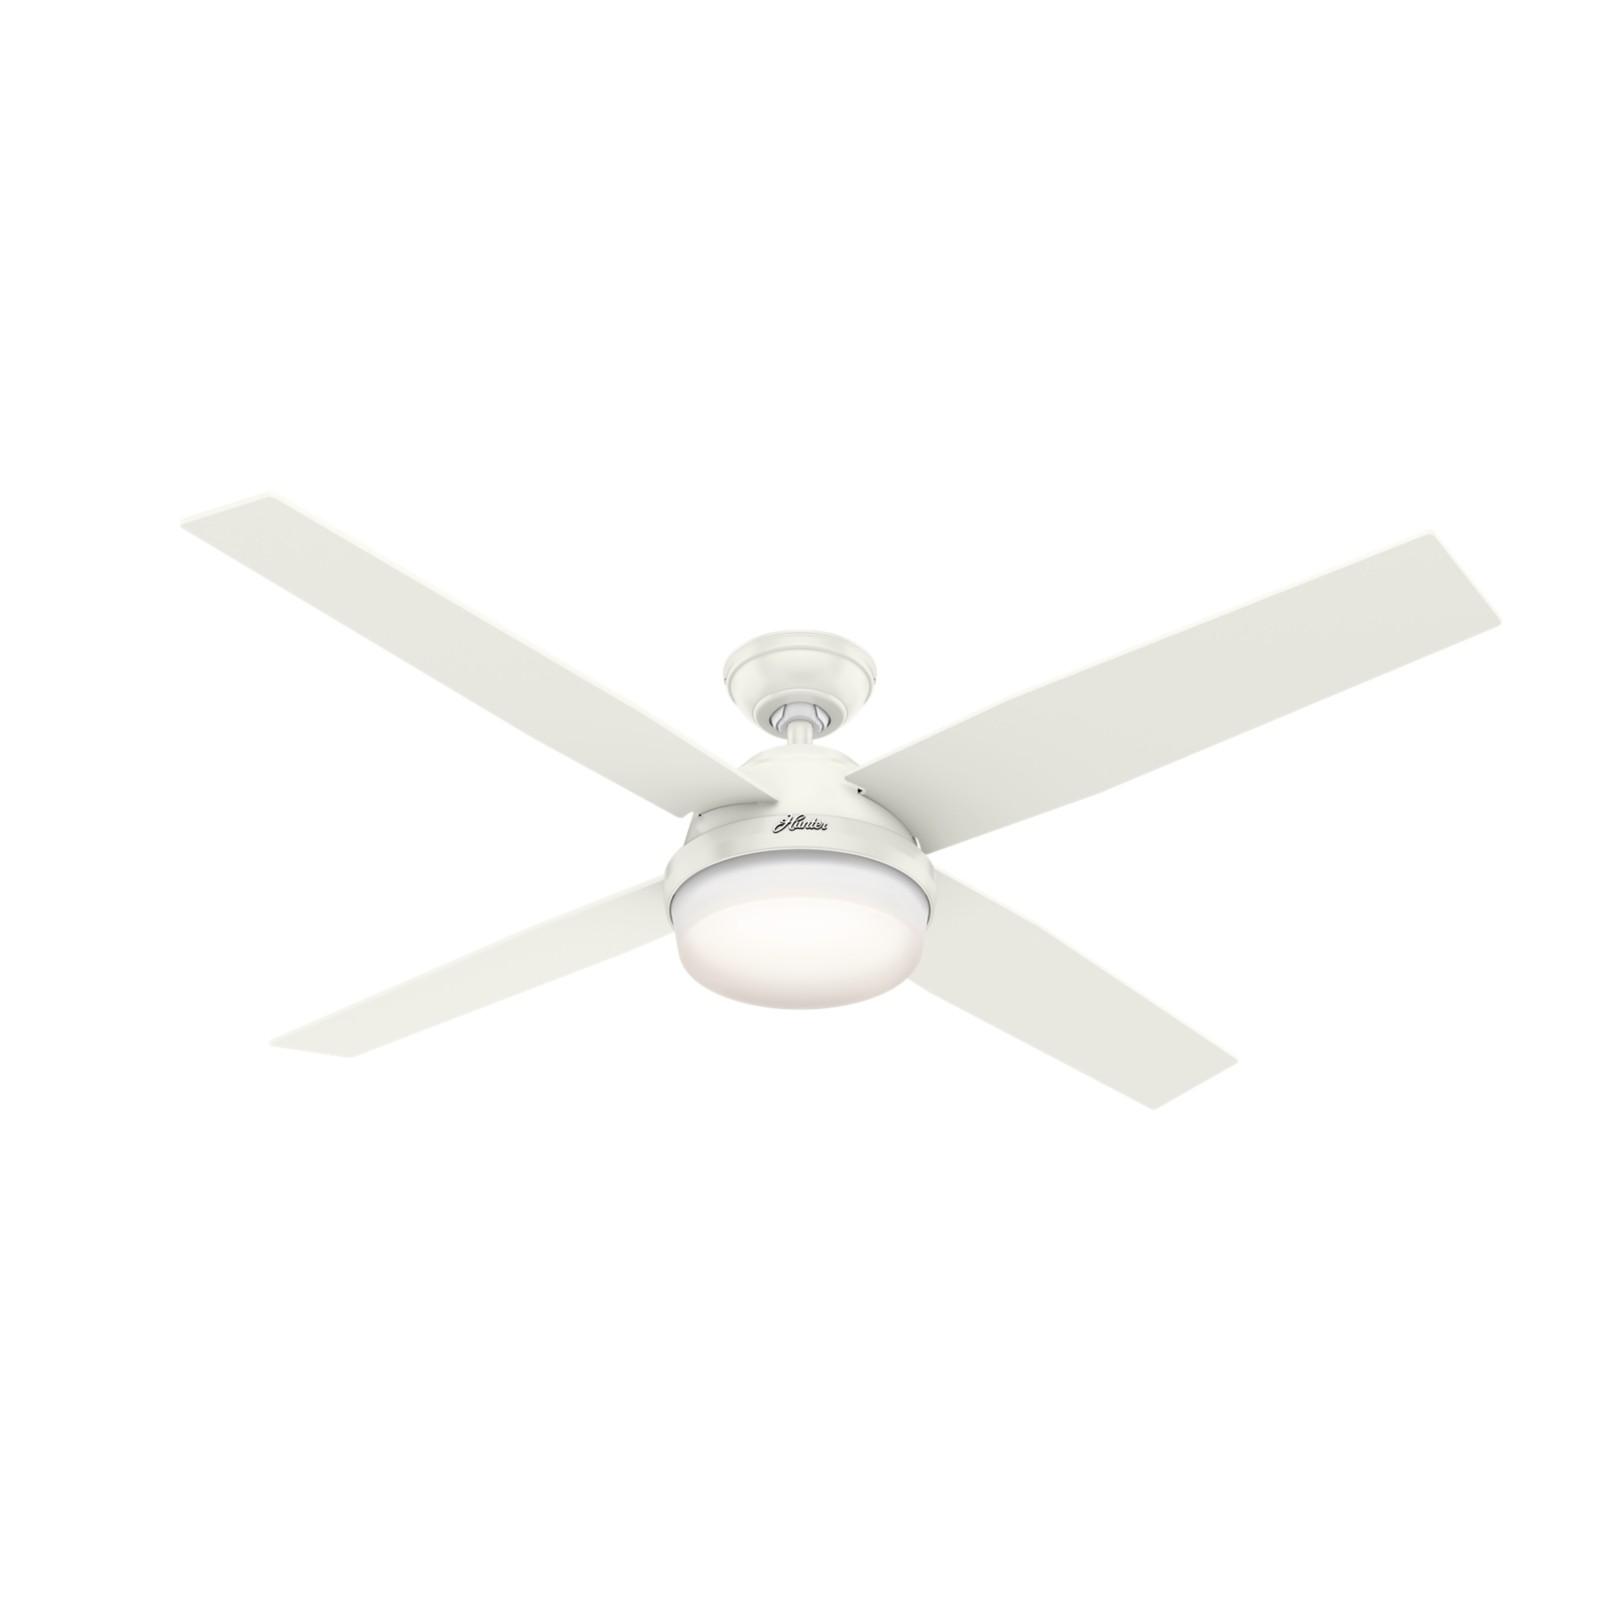 60 Inch Hunter Ceiling Fan Fans Ideas Fairhaven 22549 Wiring Diagram Dempsey With Light